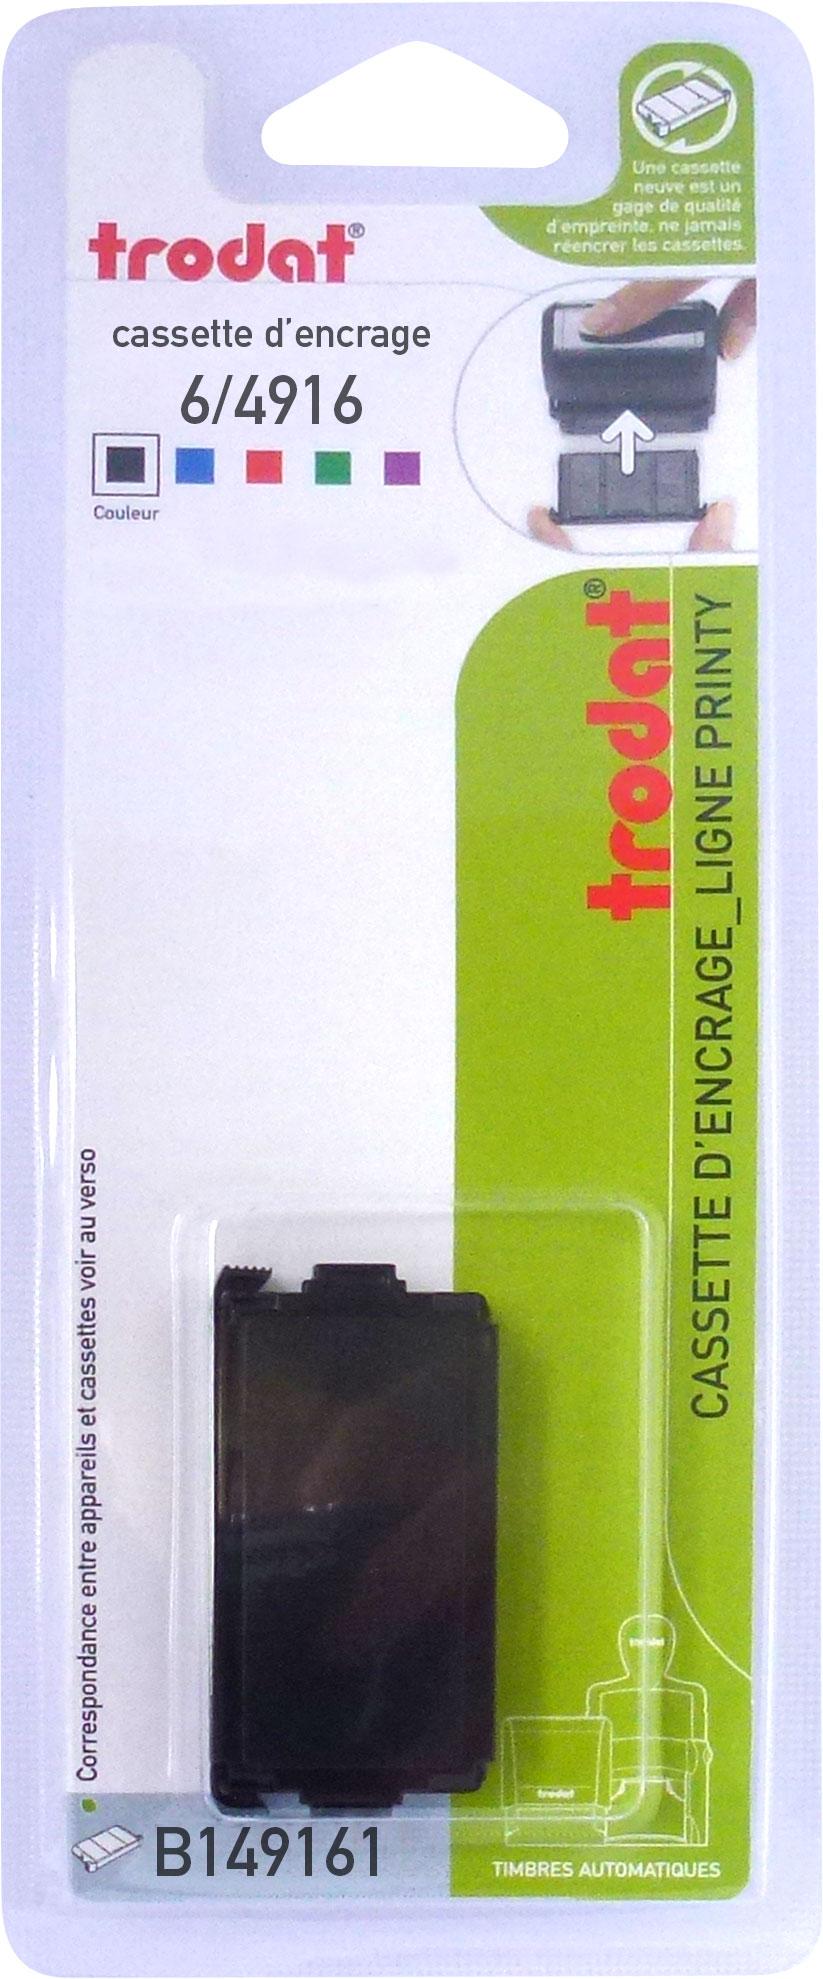 Trodat - Encrier 6/4916 recharge pour tampon Printy 4916 - noir